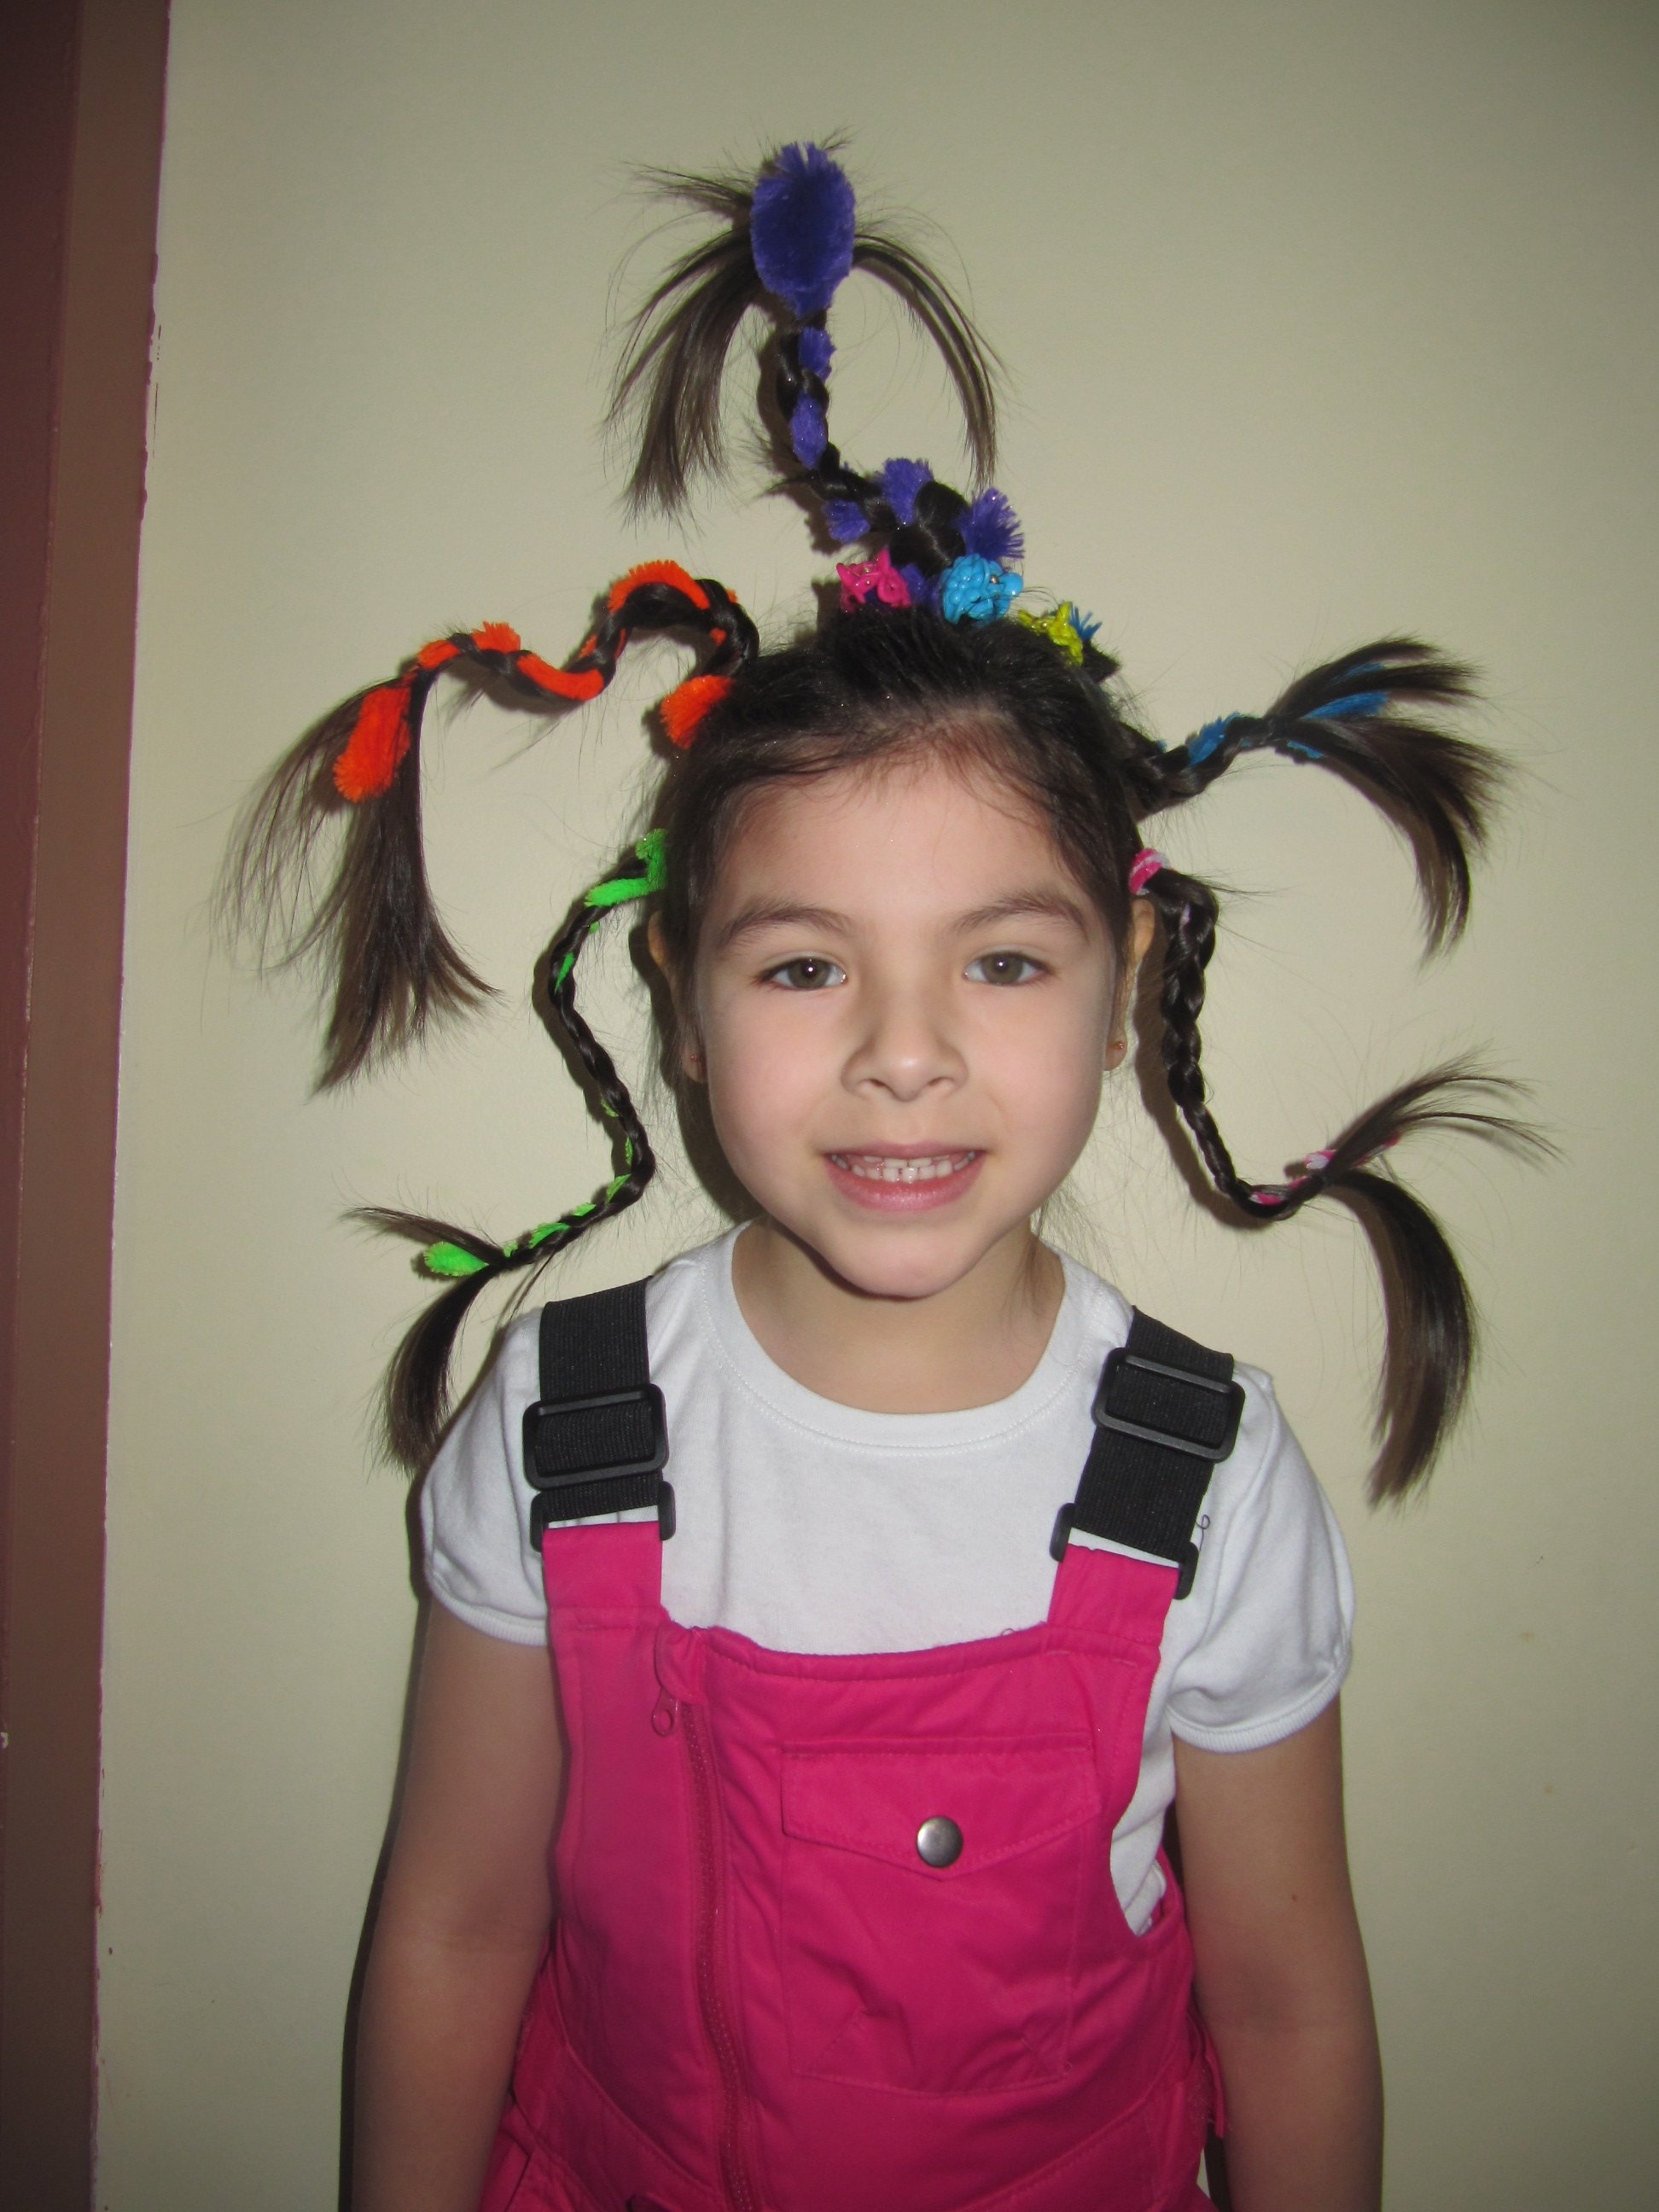 10 Famous Wacky Hair Day Ideas For School pincherie worthen garner on seussical the musical pinterest